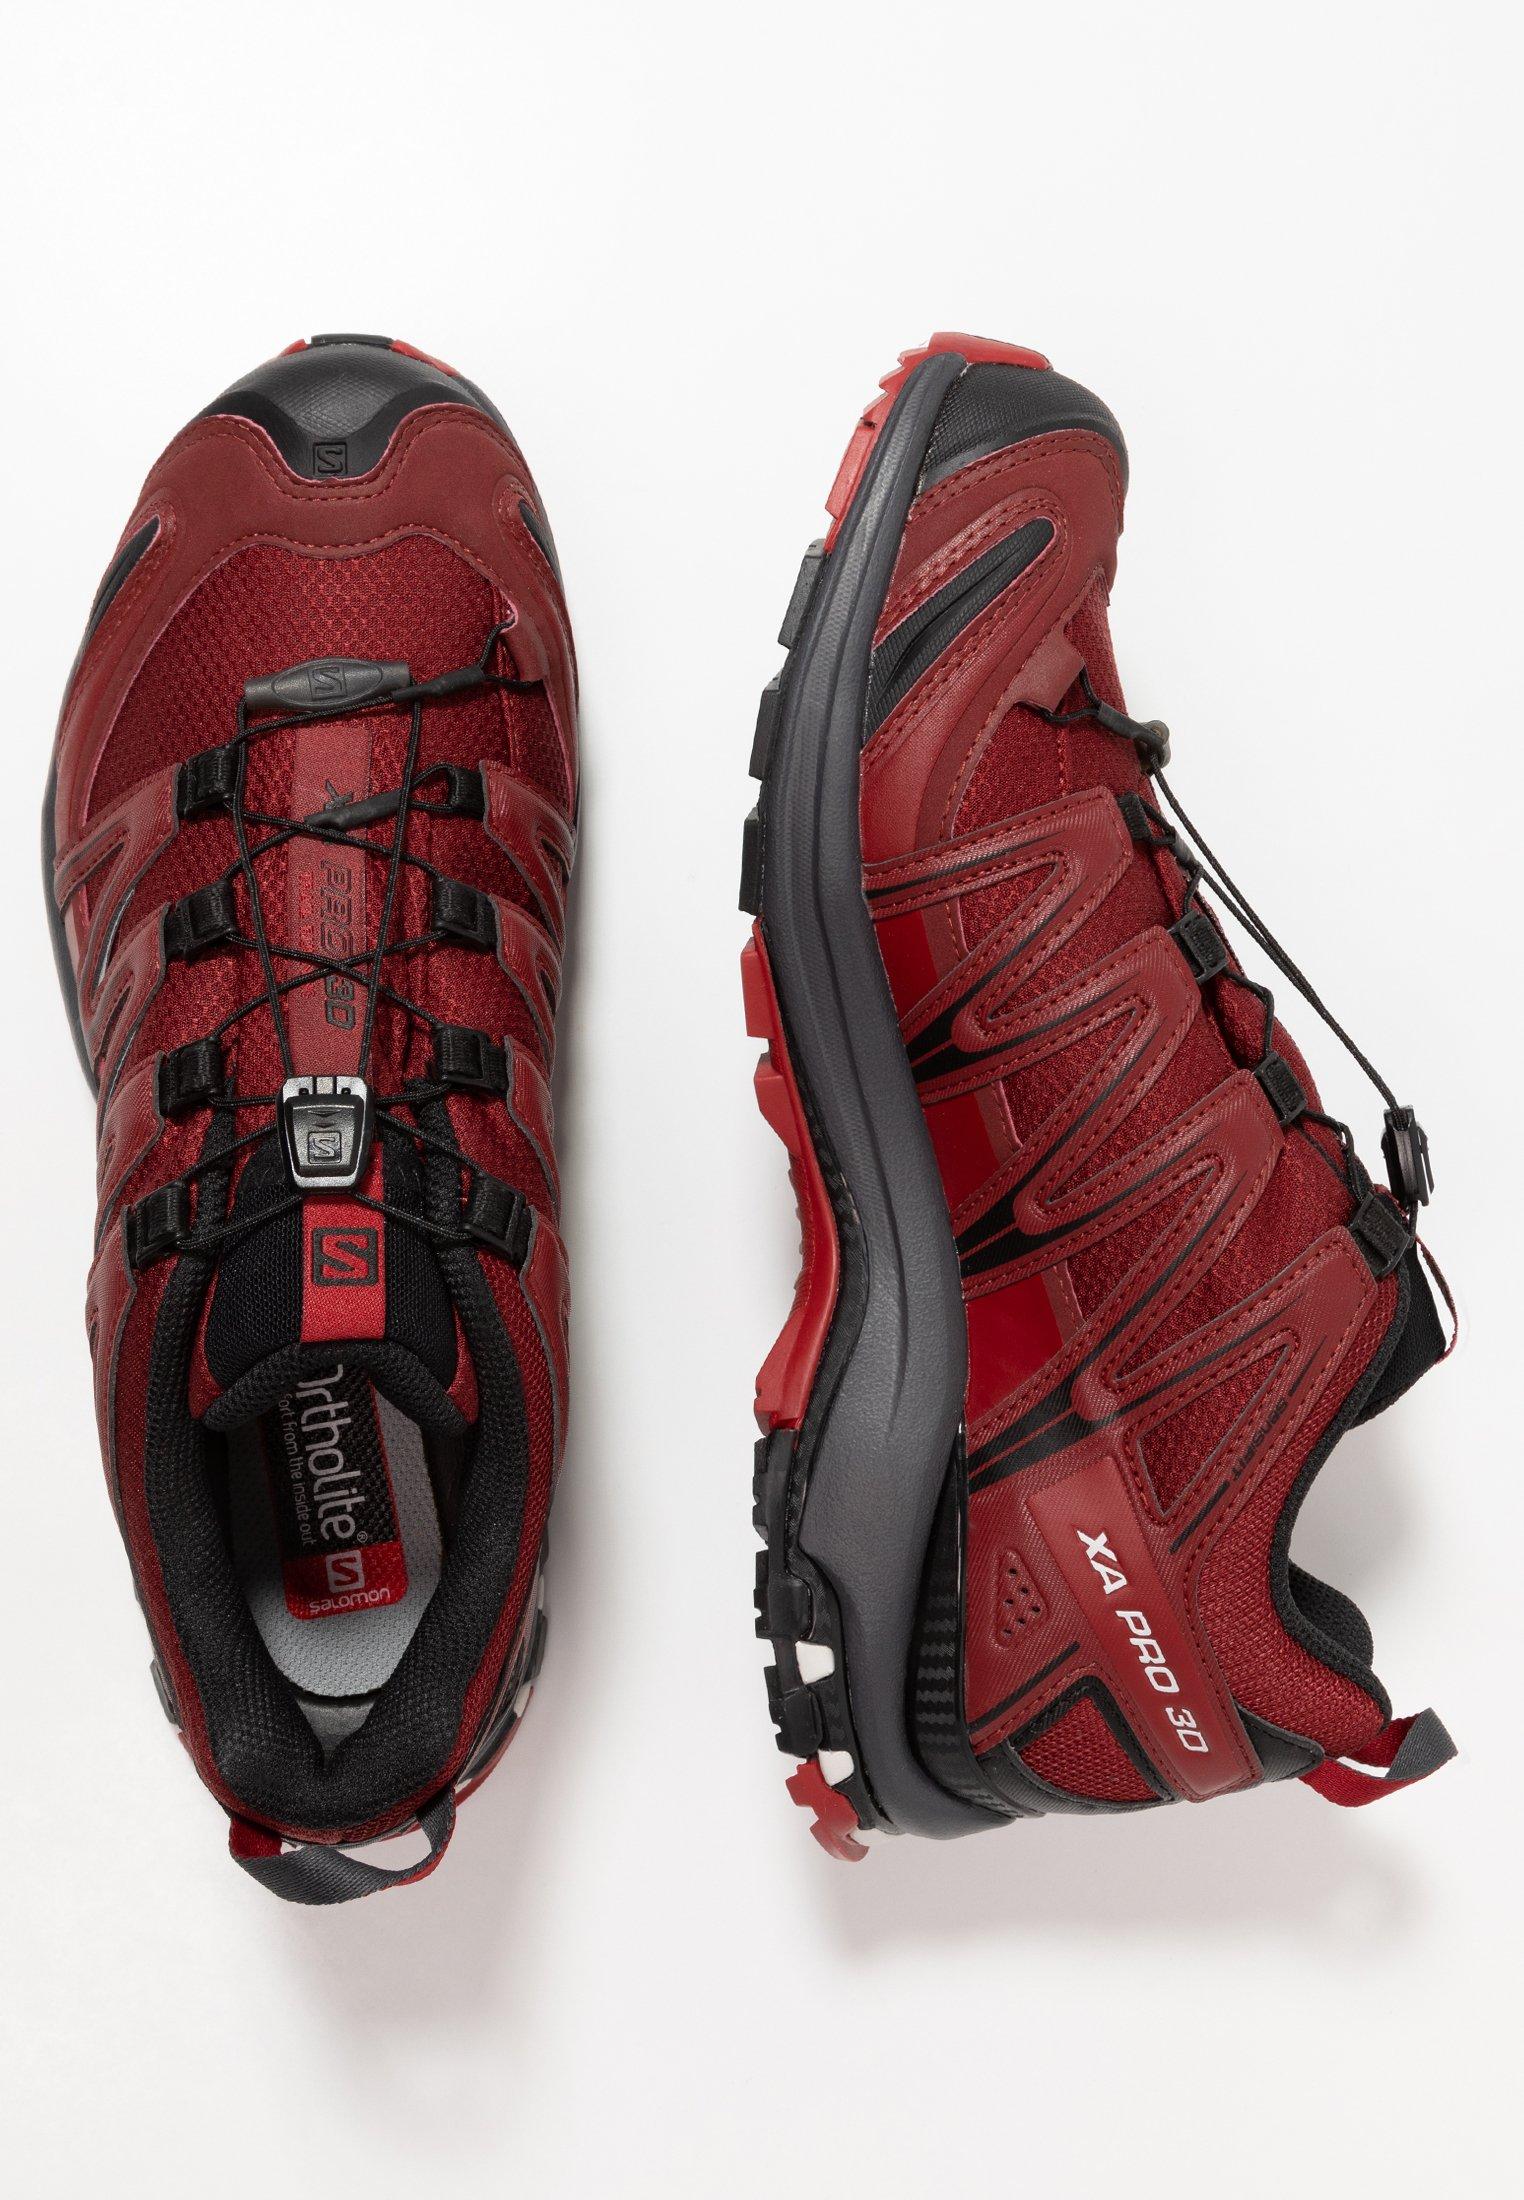 xa pro 3d laufschuh trail red